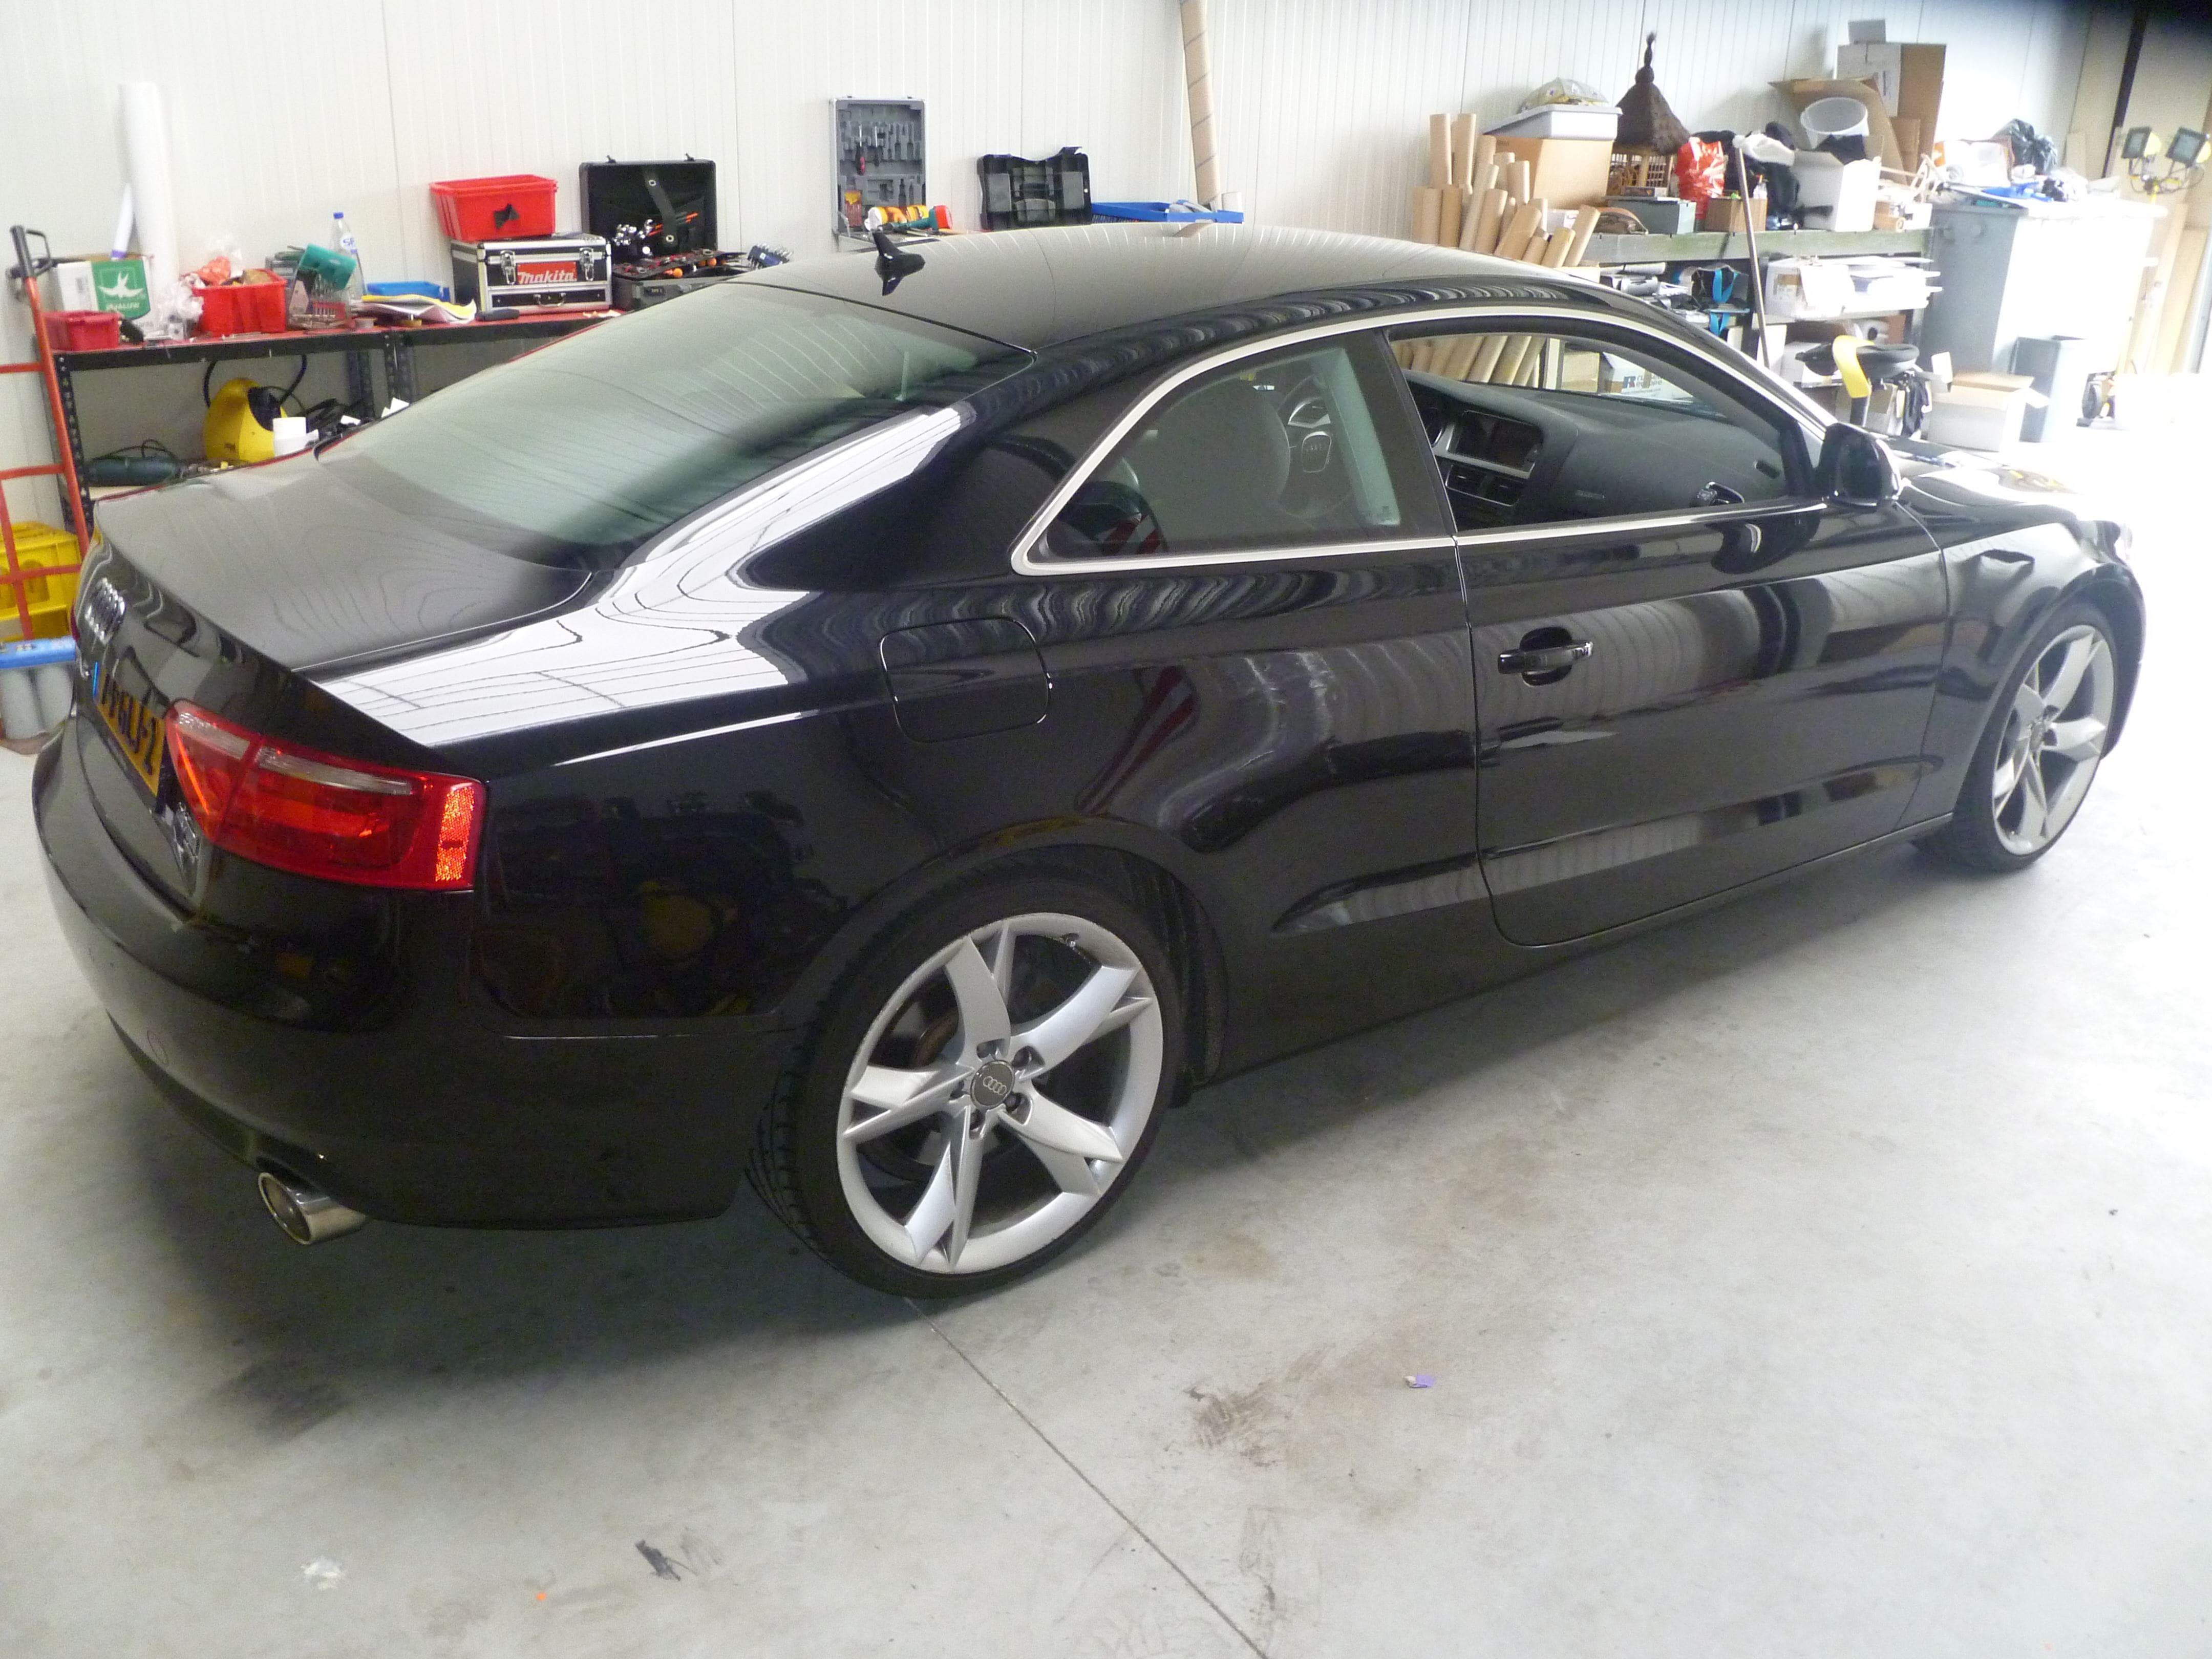 Audi A5 coupe met Metallic Witte Wrap, Carwrapping door Wrapmyride.nu Foto-nr:4672, ©2021